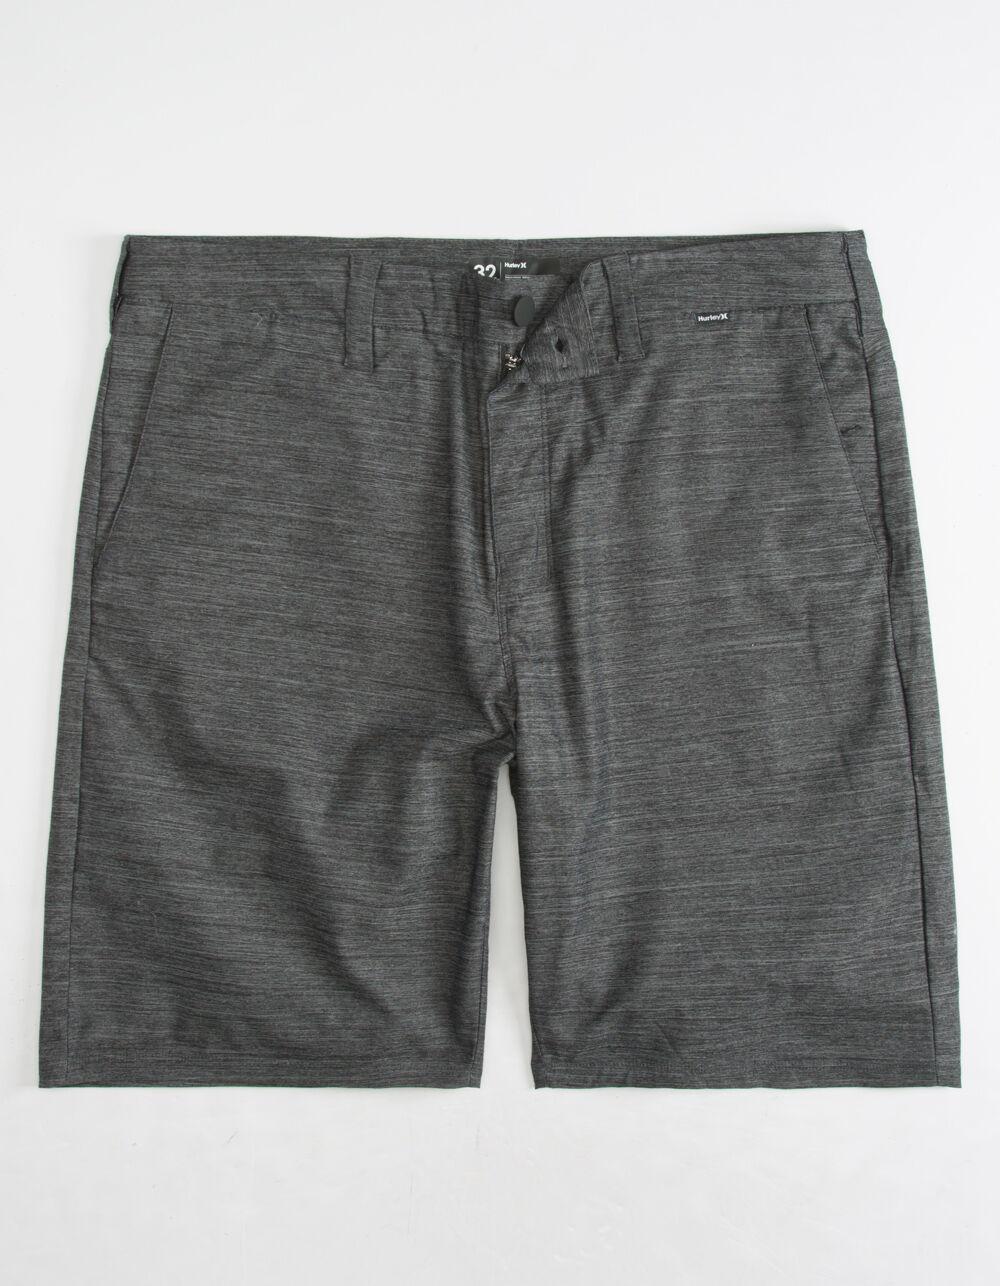 HURLEY Dri-FIT Breathe Black Shorts